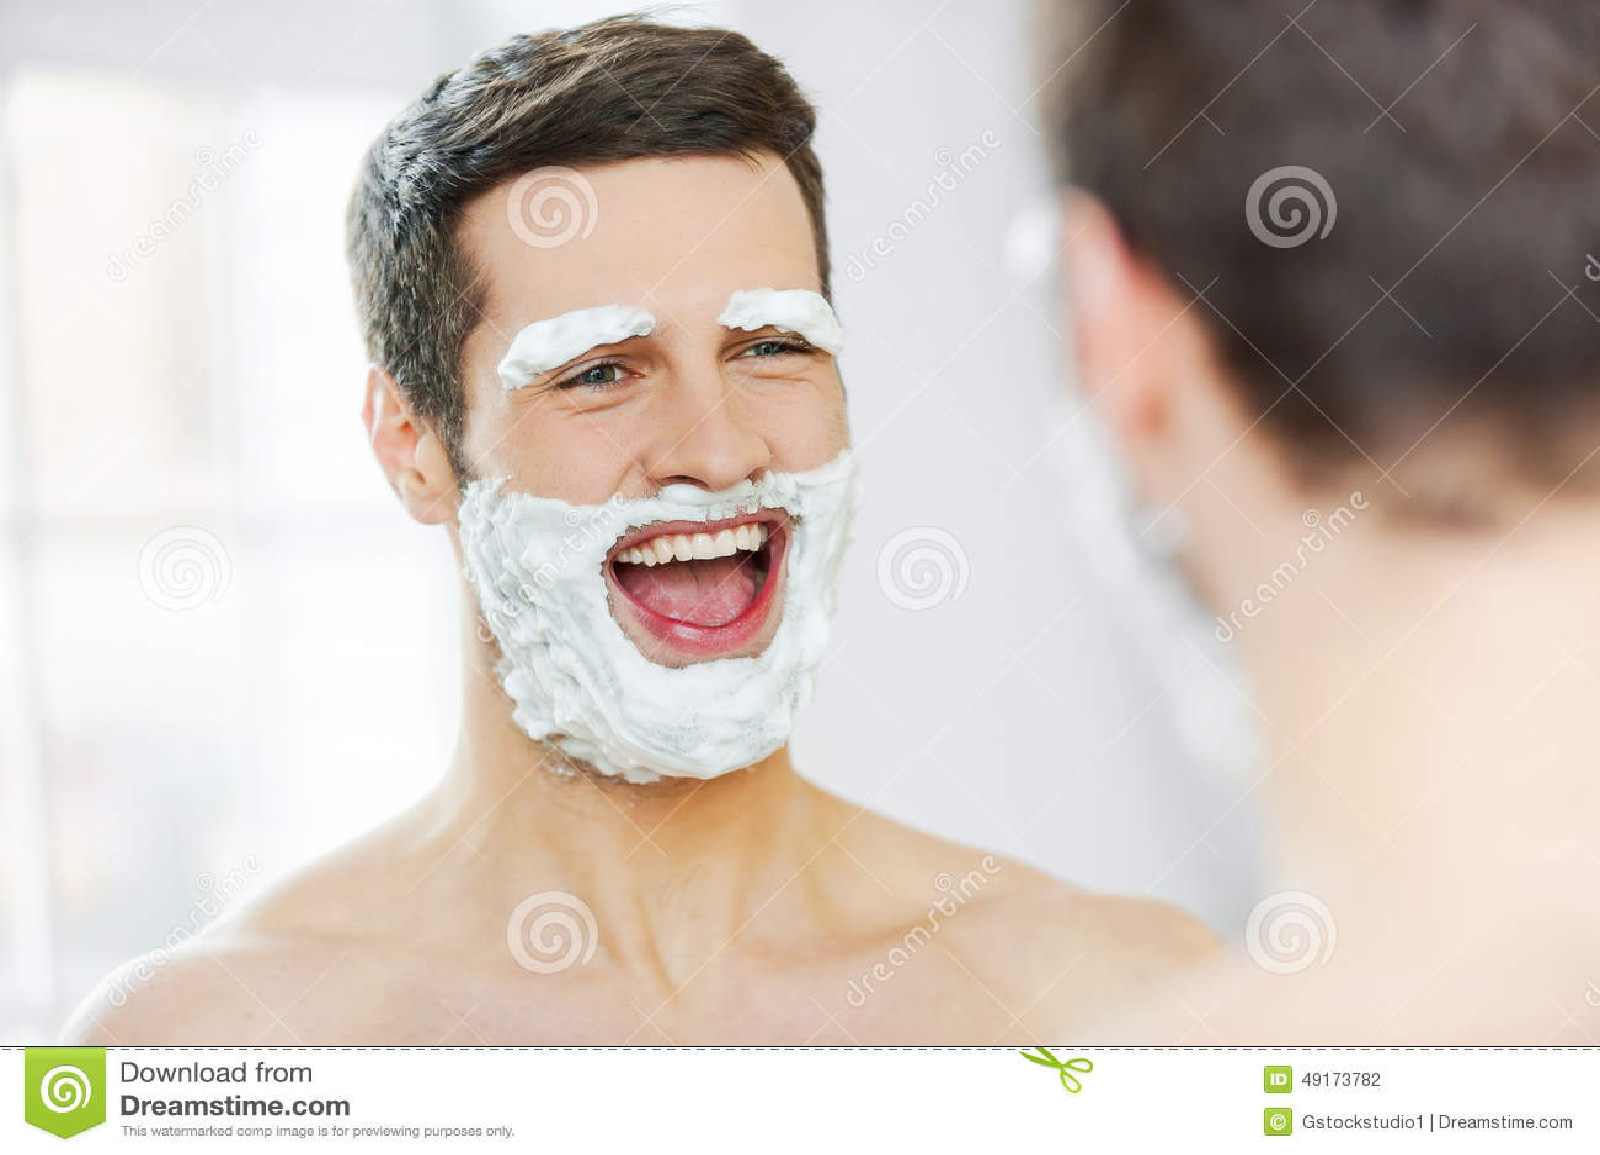 Shaving with fun.